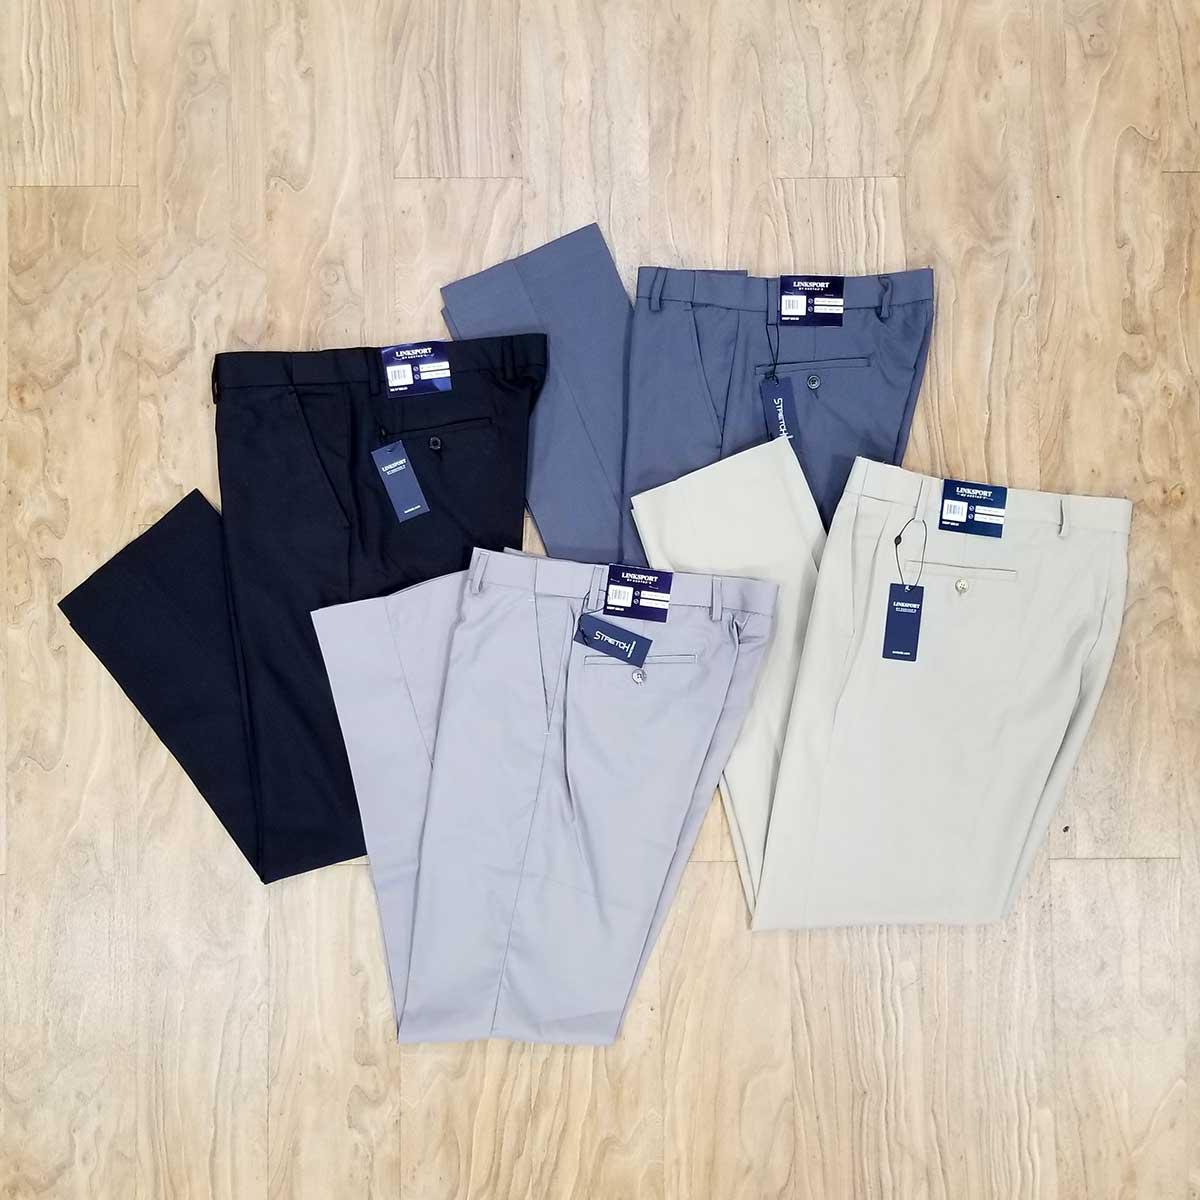 Linksport Premium Golf Pant - Dark Grey